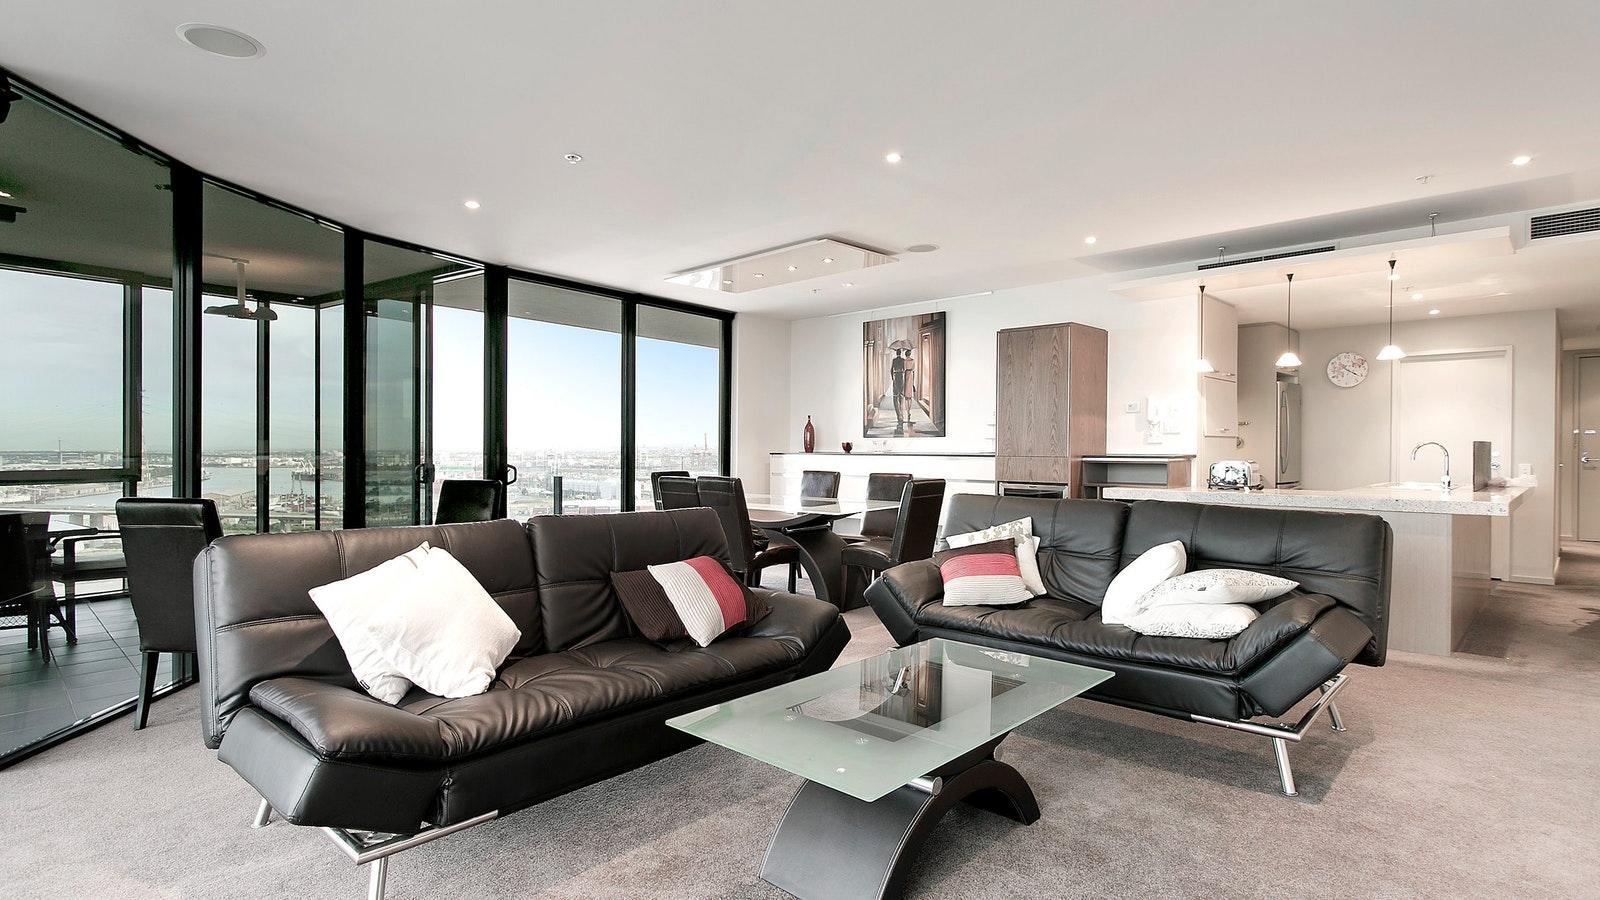 Melbourne Serviced Apartments - Penthouse